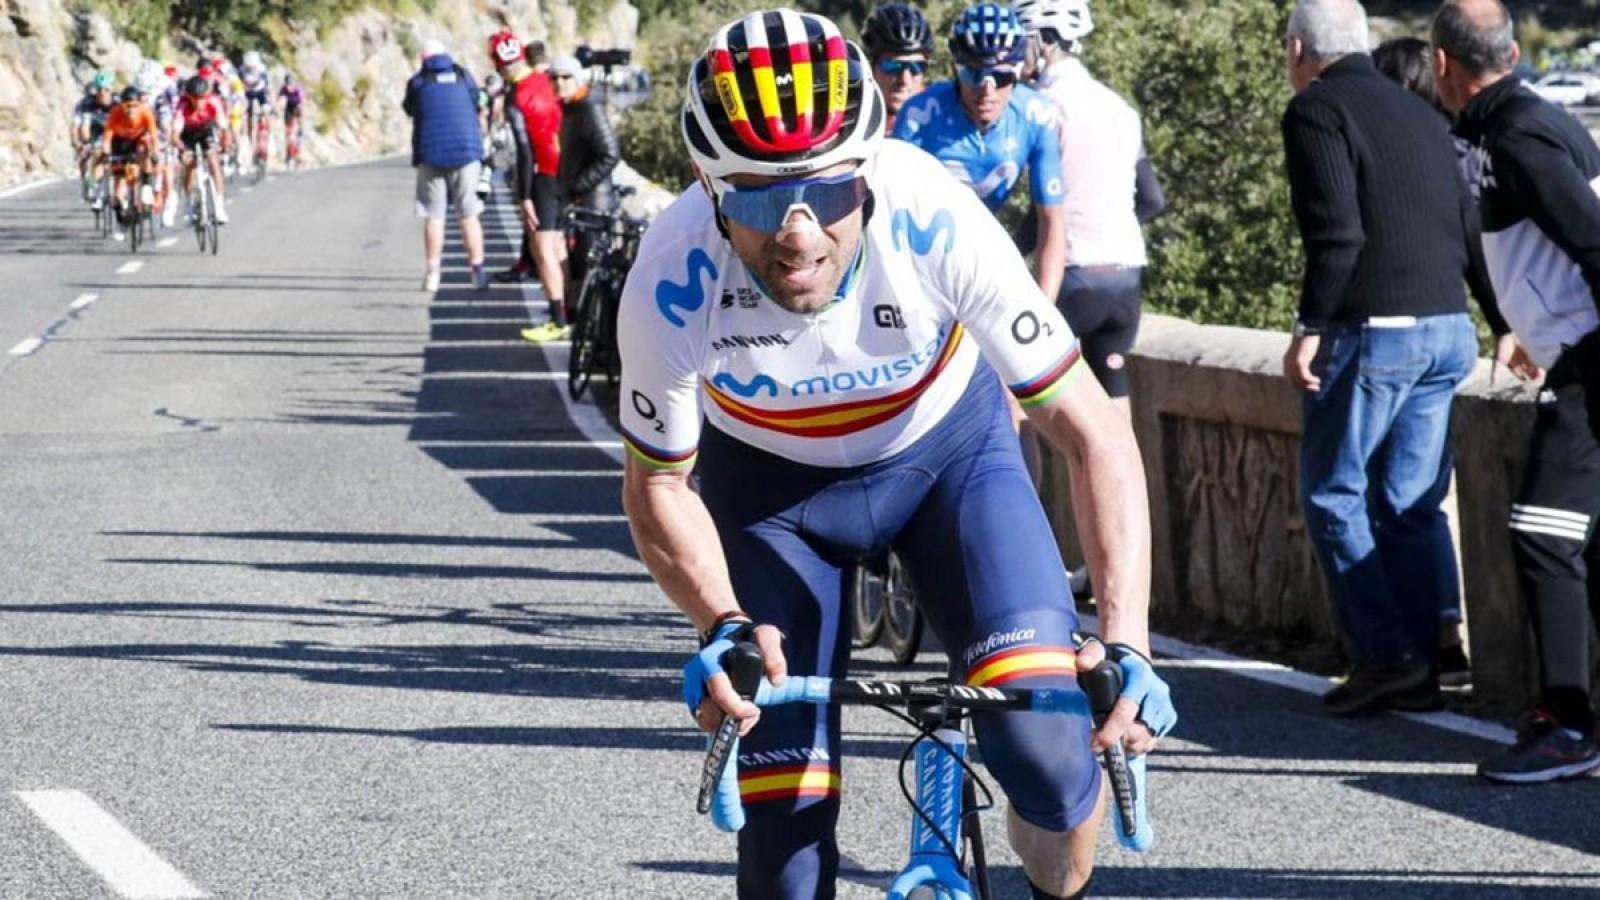 ciclismo-coronavirus-vuelta-burgos/